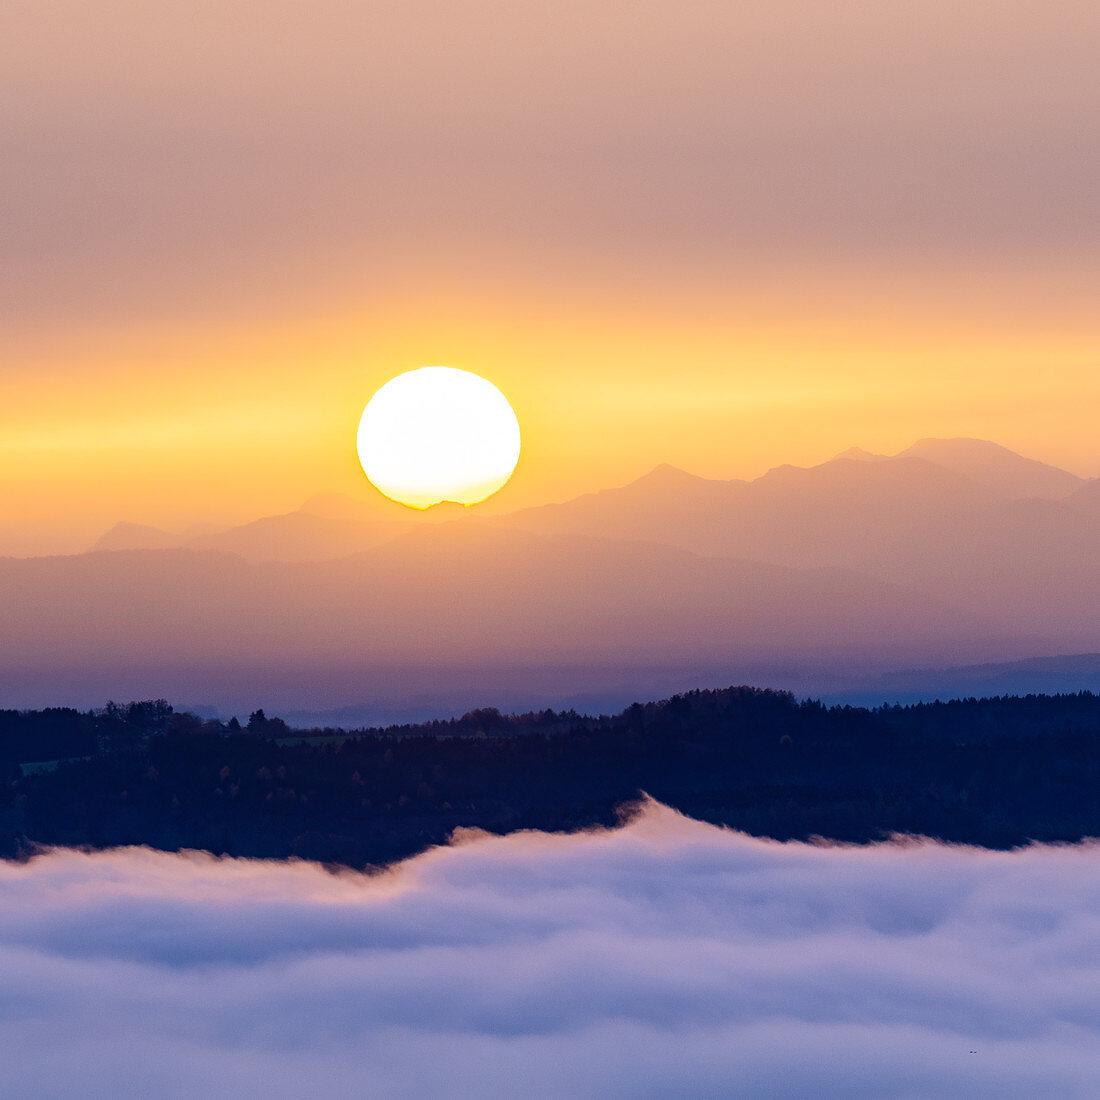 Nebel am Starnberger See, Ilkahöhe, Tutzing, Bayern, Deutschland